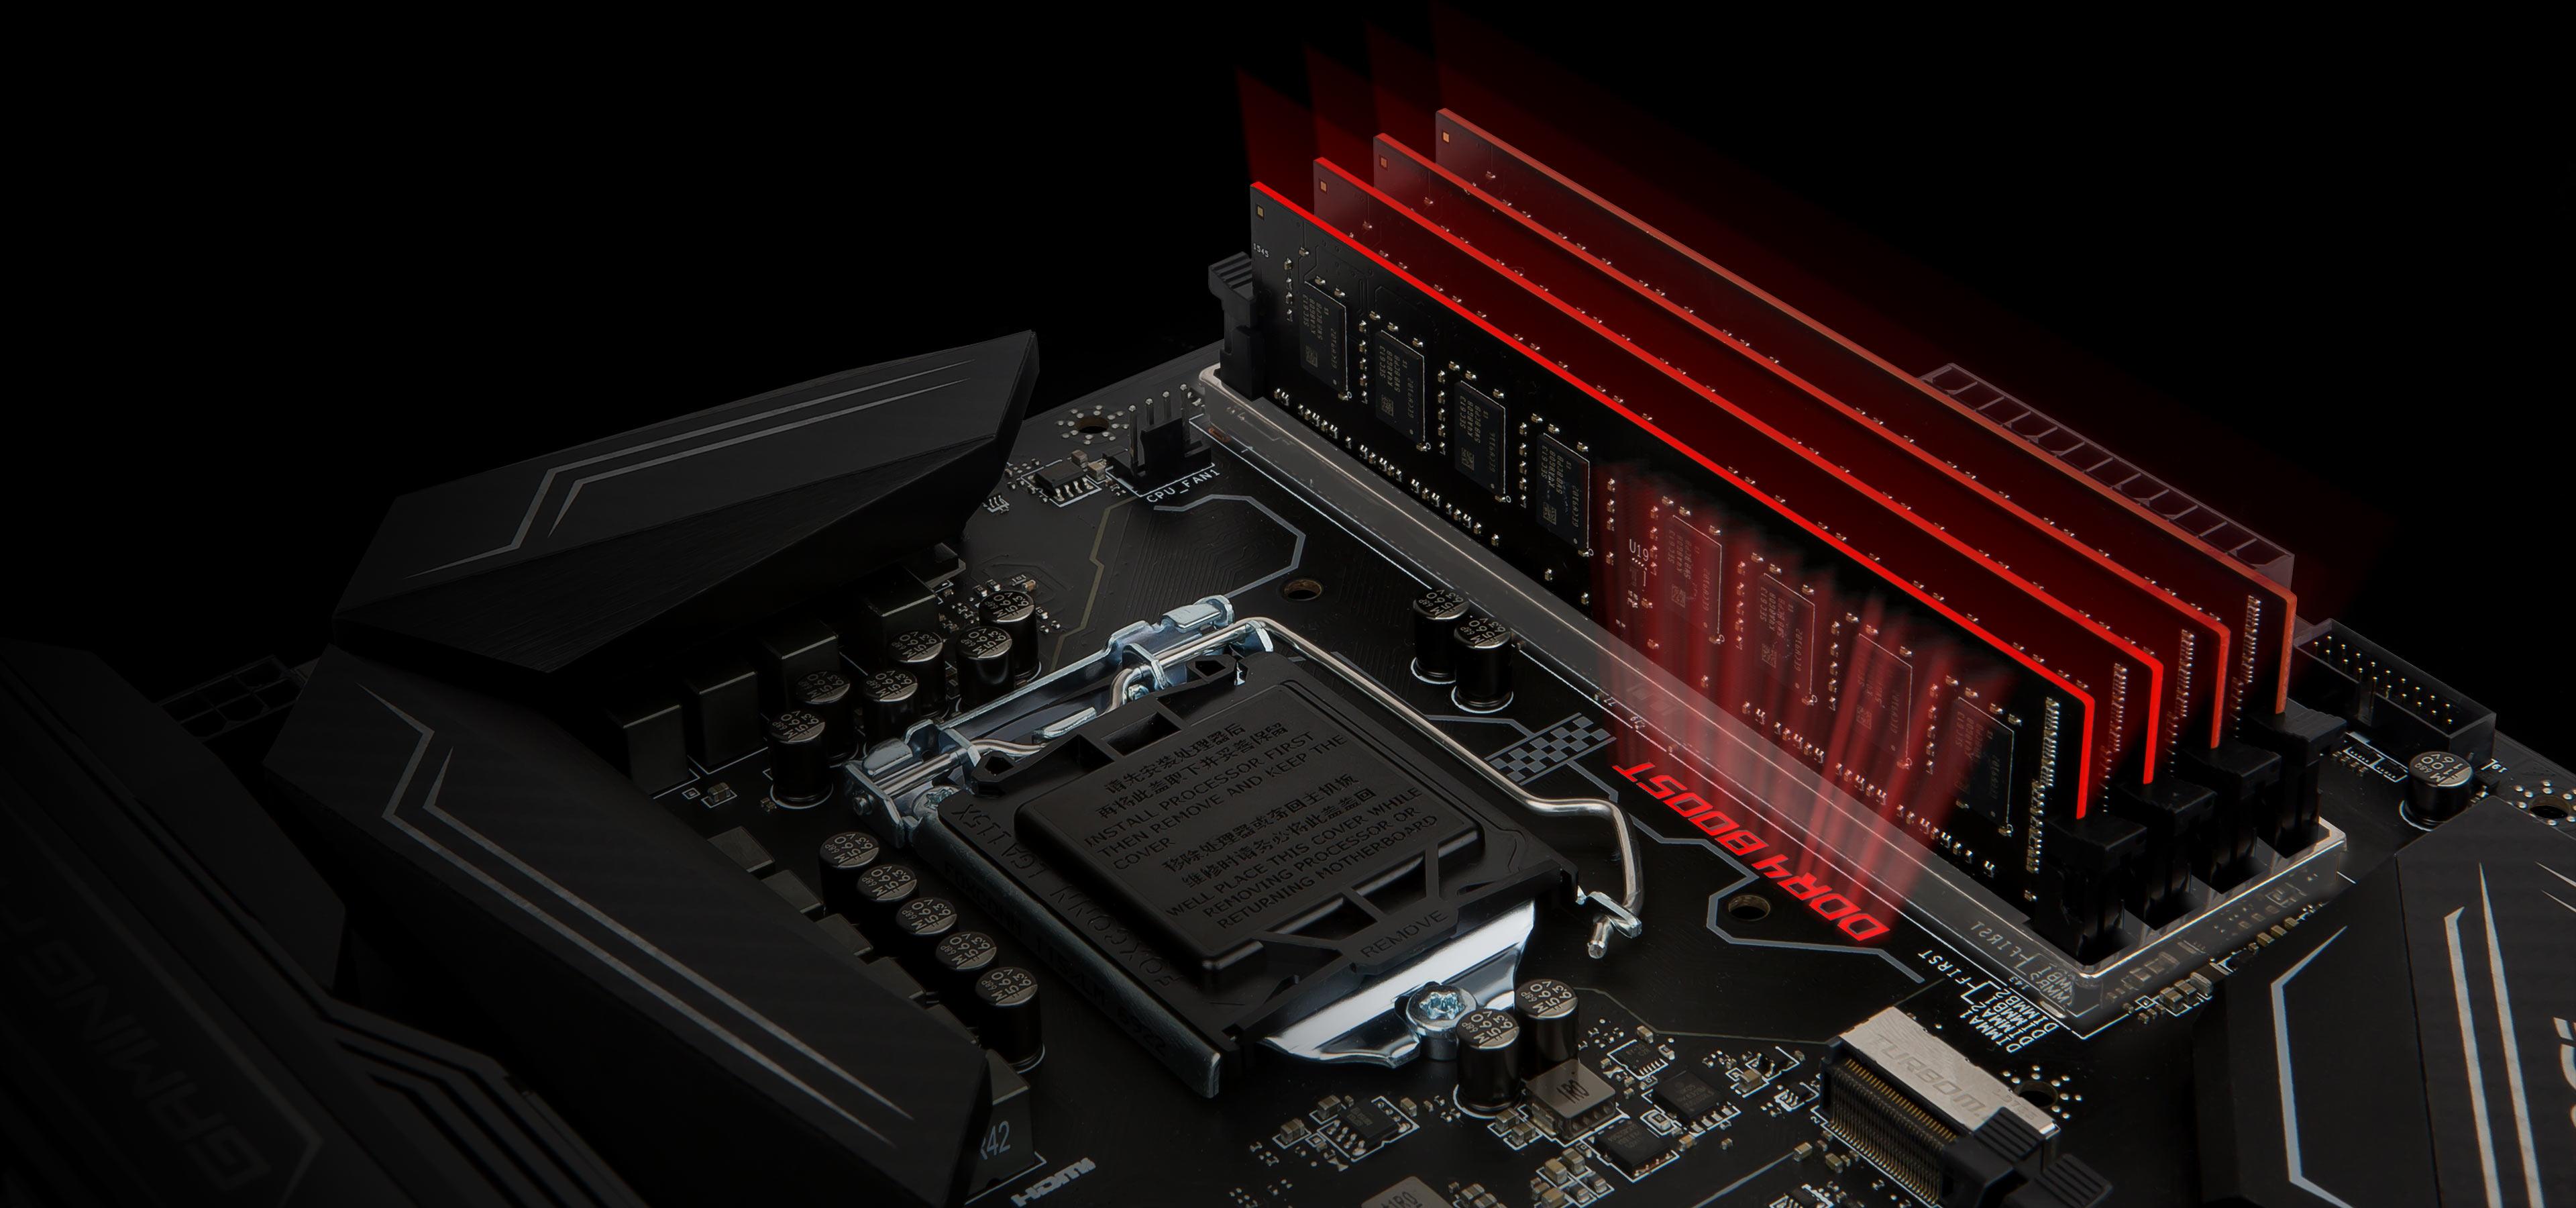 MSI Z270 Gaming Pro Carbon LGA1151 ATX Motherboard